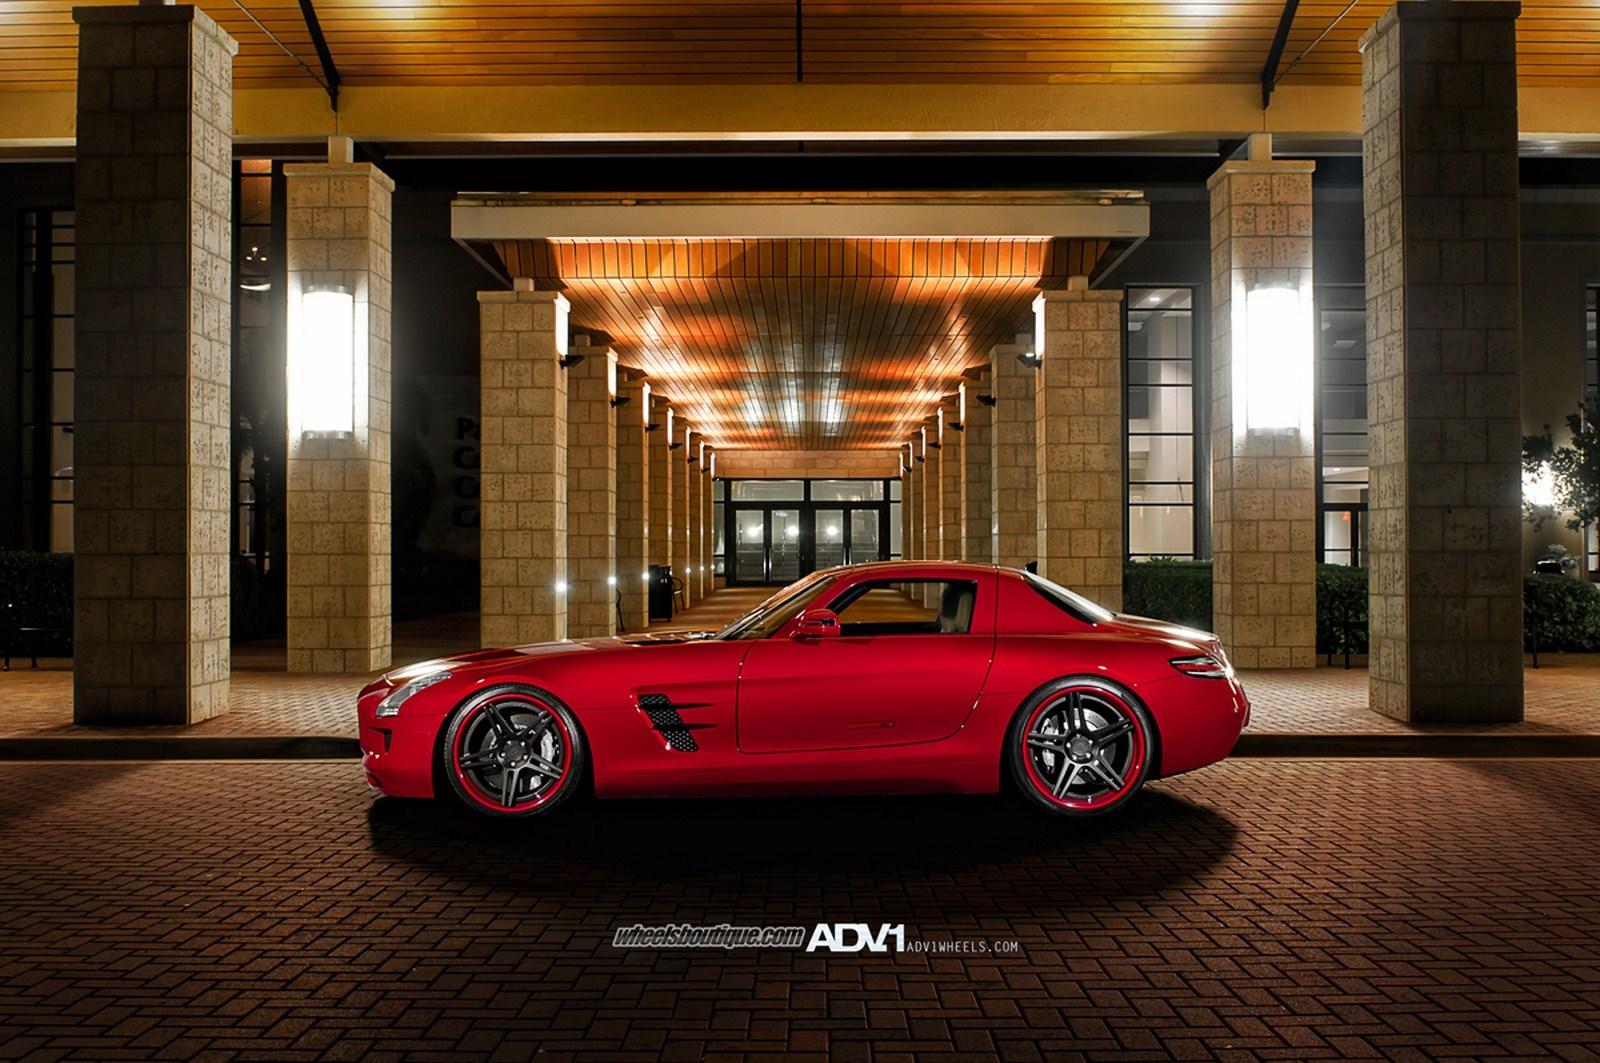 http://1.bp.blogspot.com/-6vP6t0AHxJ4/TnPJS-a8l3I/AAAAAAAAAb0/GYHxaDDezyY/s1600/Red+Mercedes+Benz+SLS+63+AMG+-+PremiumWallpapersHD.Blogspot.Com.jpg